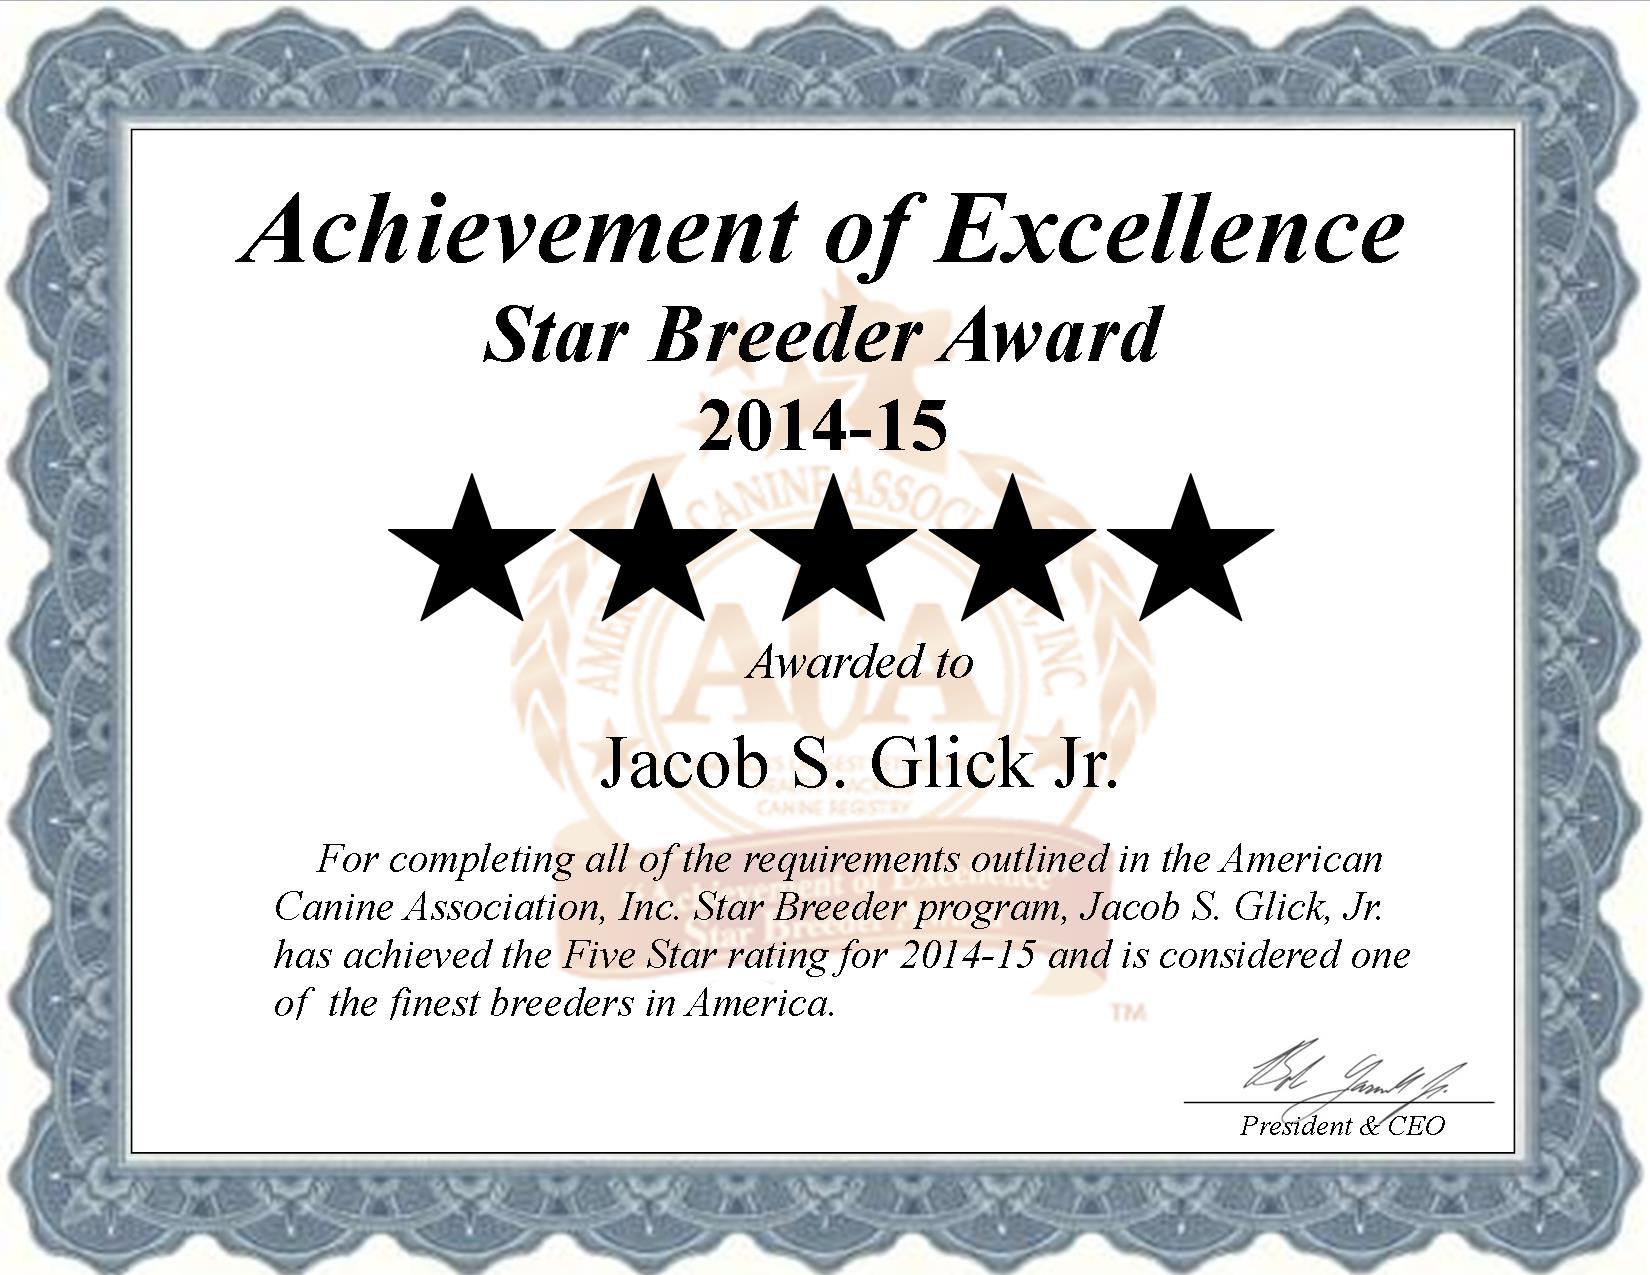 Jacob S. Glick, Jr., Glick, Jr., Jacob S., Kennel, starbreeder, star breeder, 5 star, USDA, Lancaster, Lancaster County, pet, PA, Pennsylvania, Quarryville PA, Quarryville, Doglaw, dog law, dog, puppy, puppies, ACA